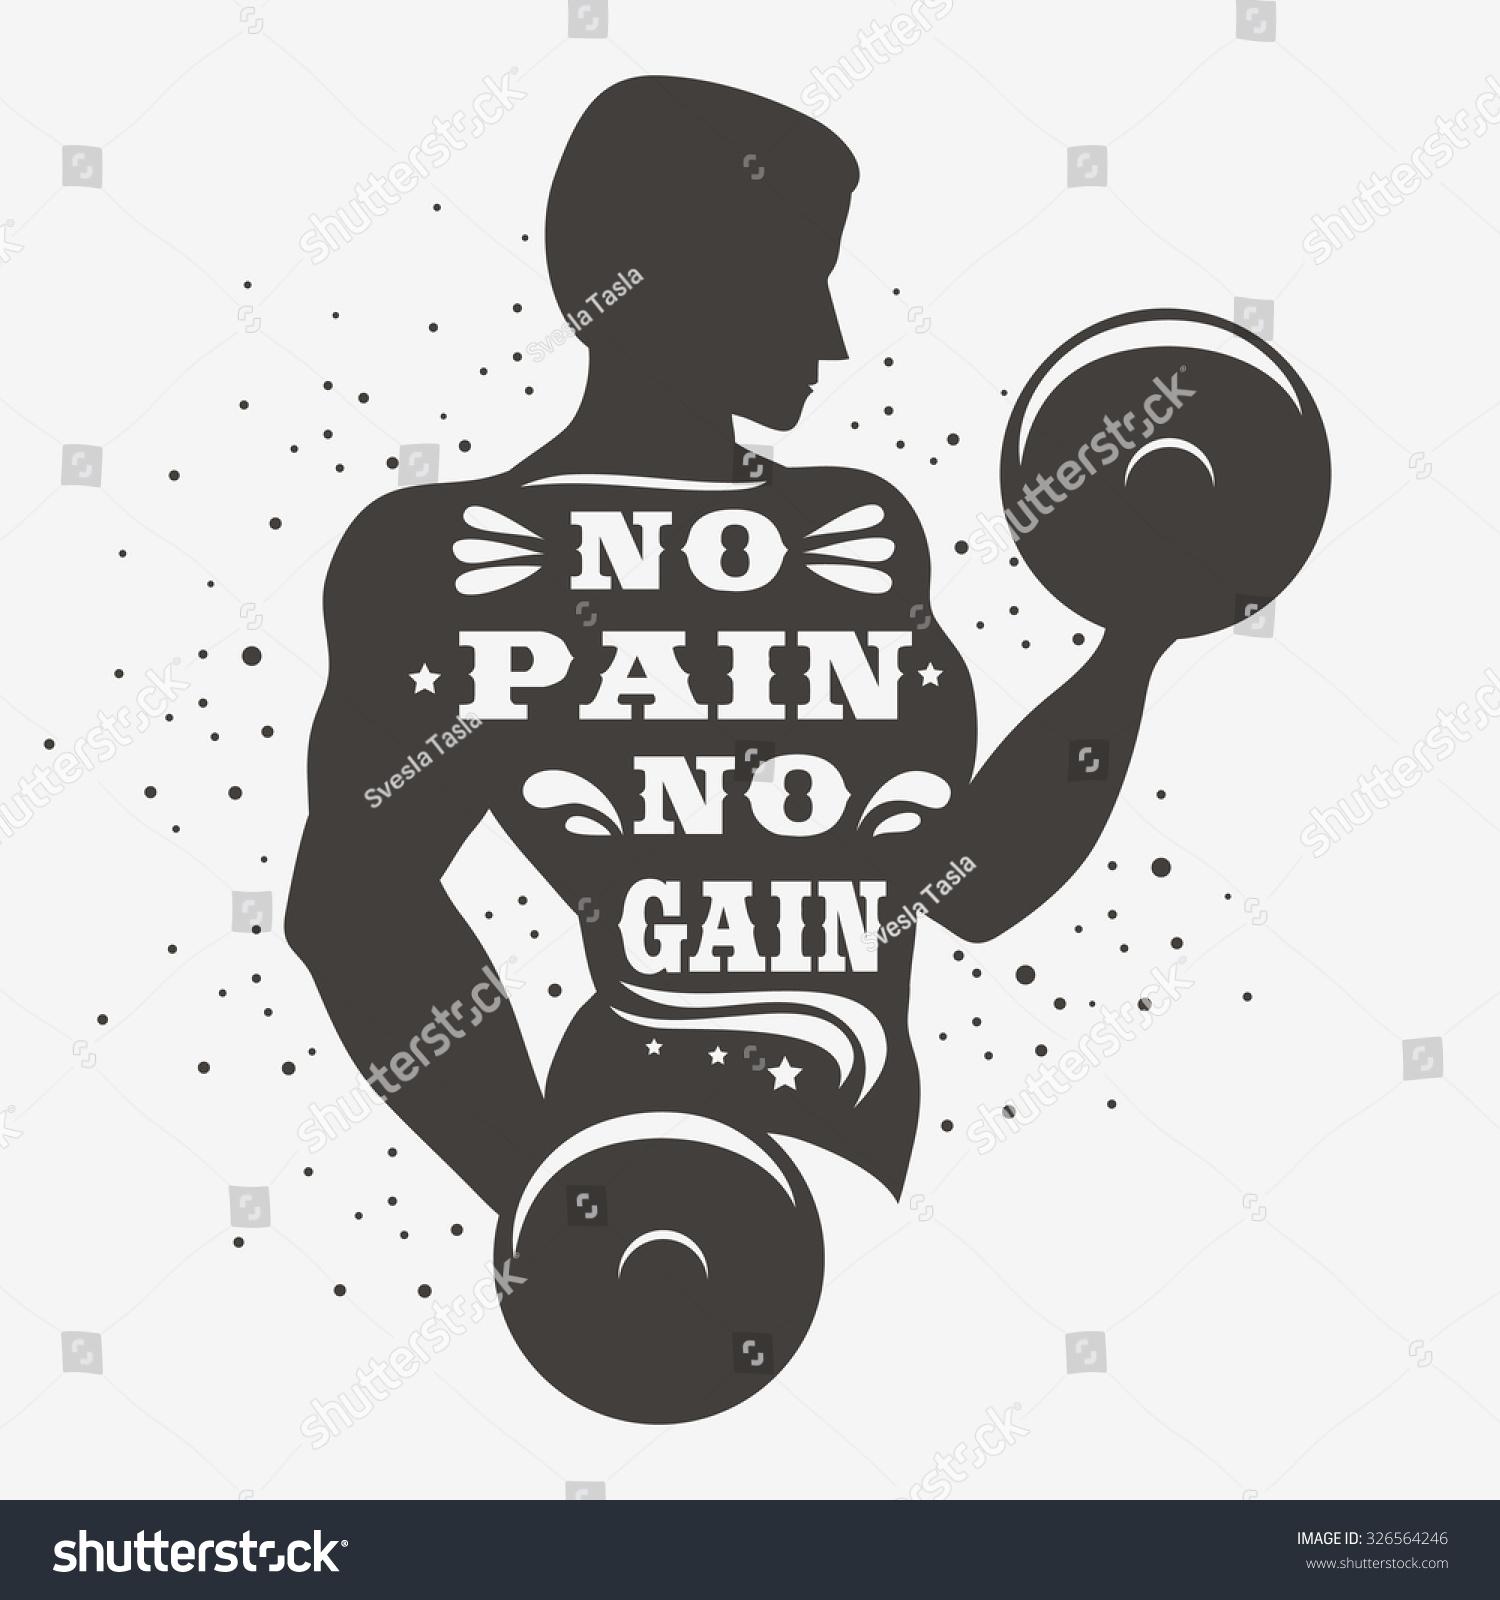 Sportfitness Typographic Poster No Pain No Stock Vector 326564246 - Shutterstock